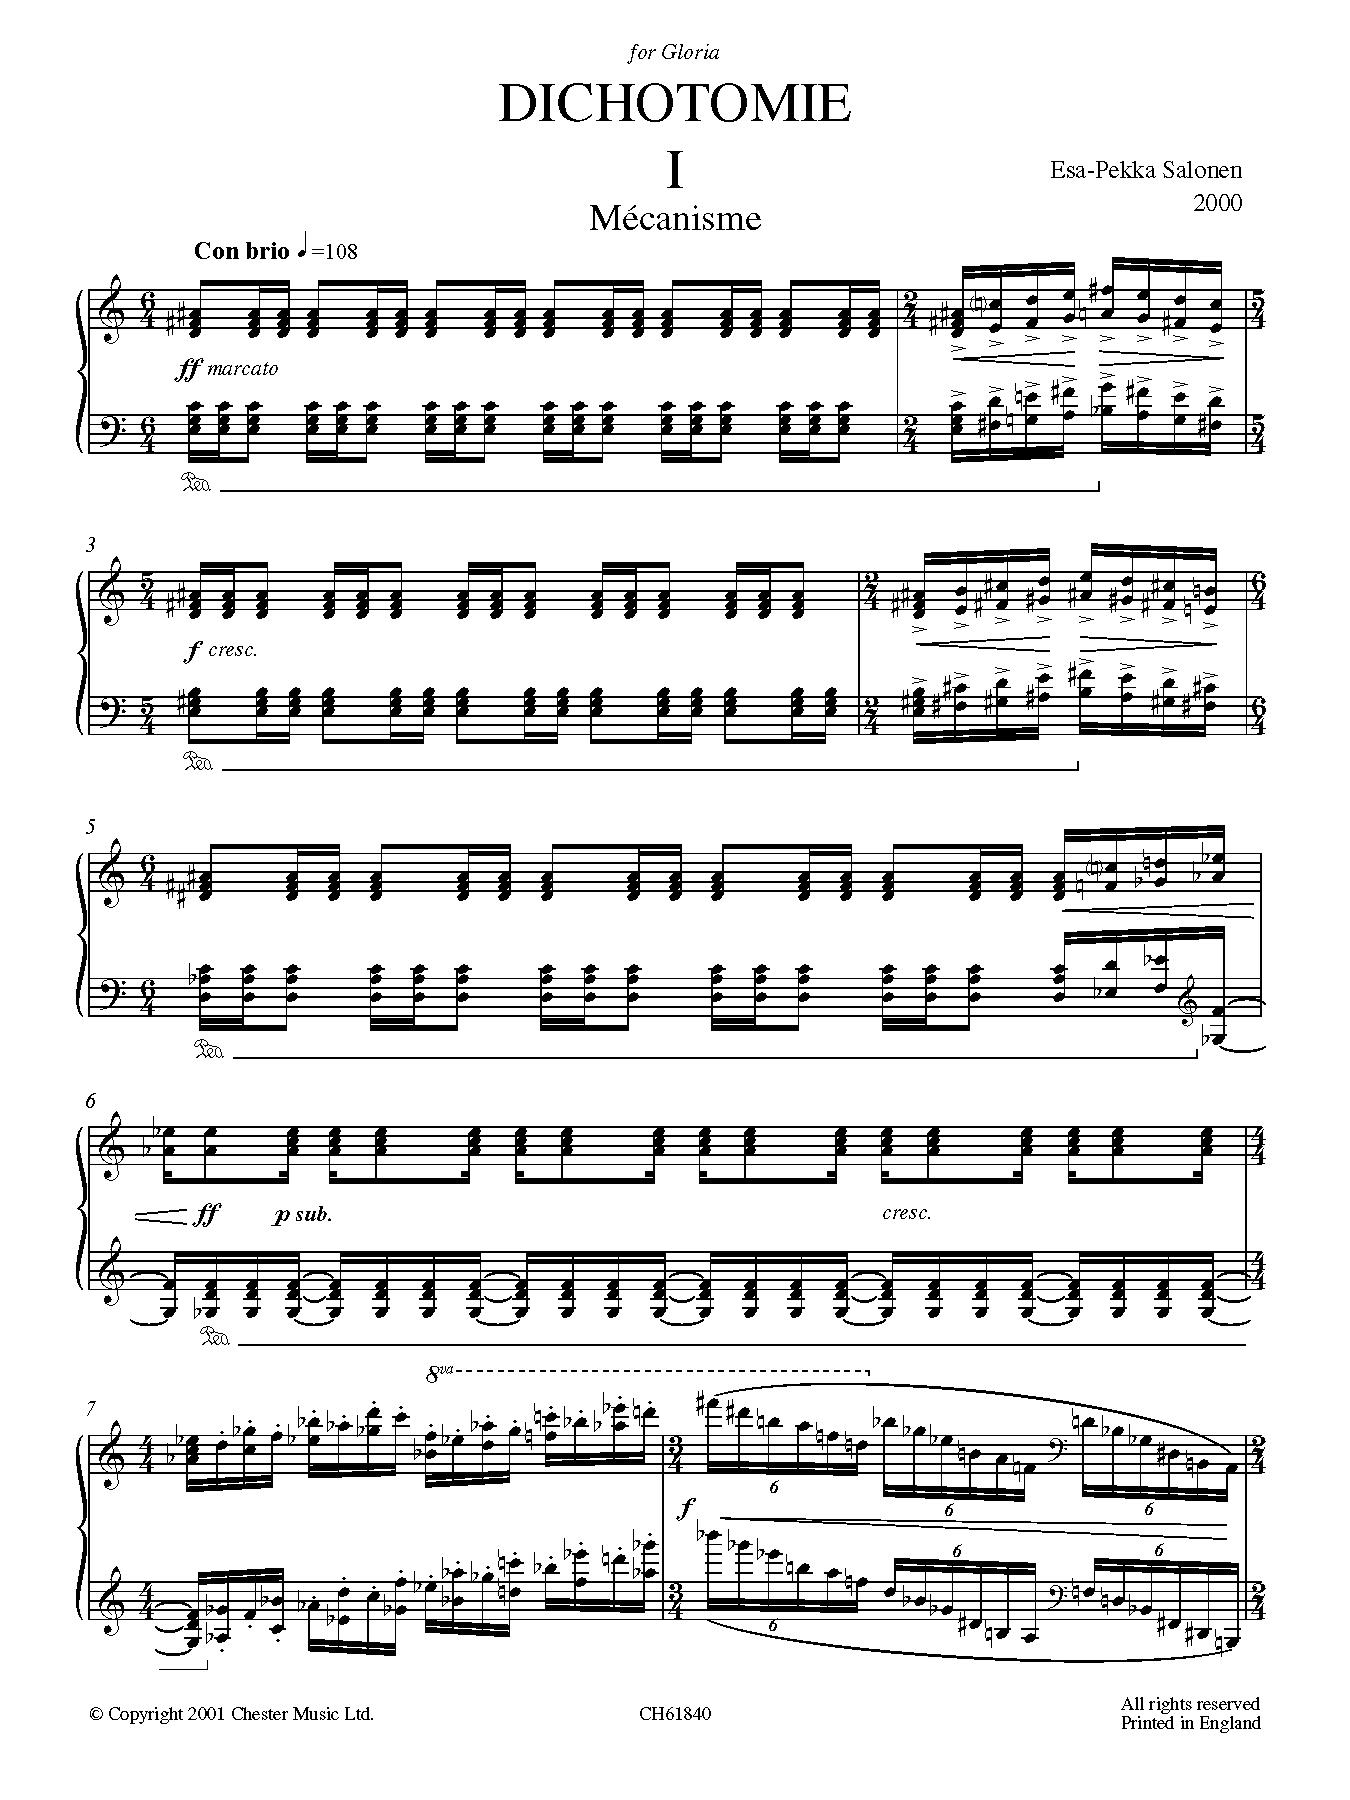 Dichotomie I - Méchanisme sheet music